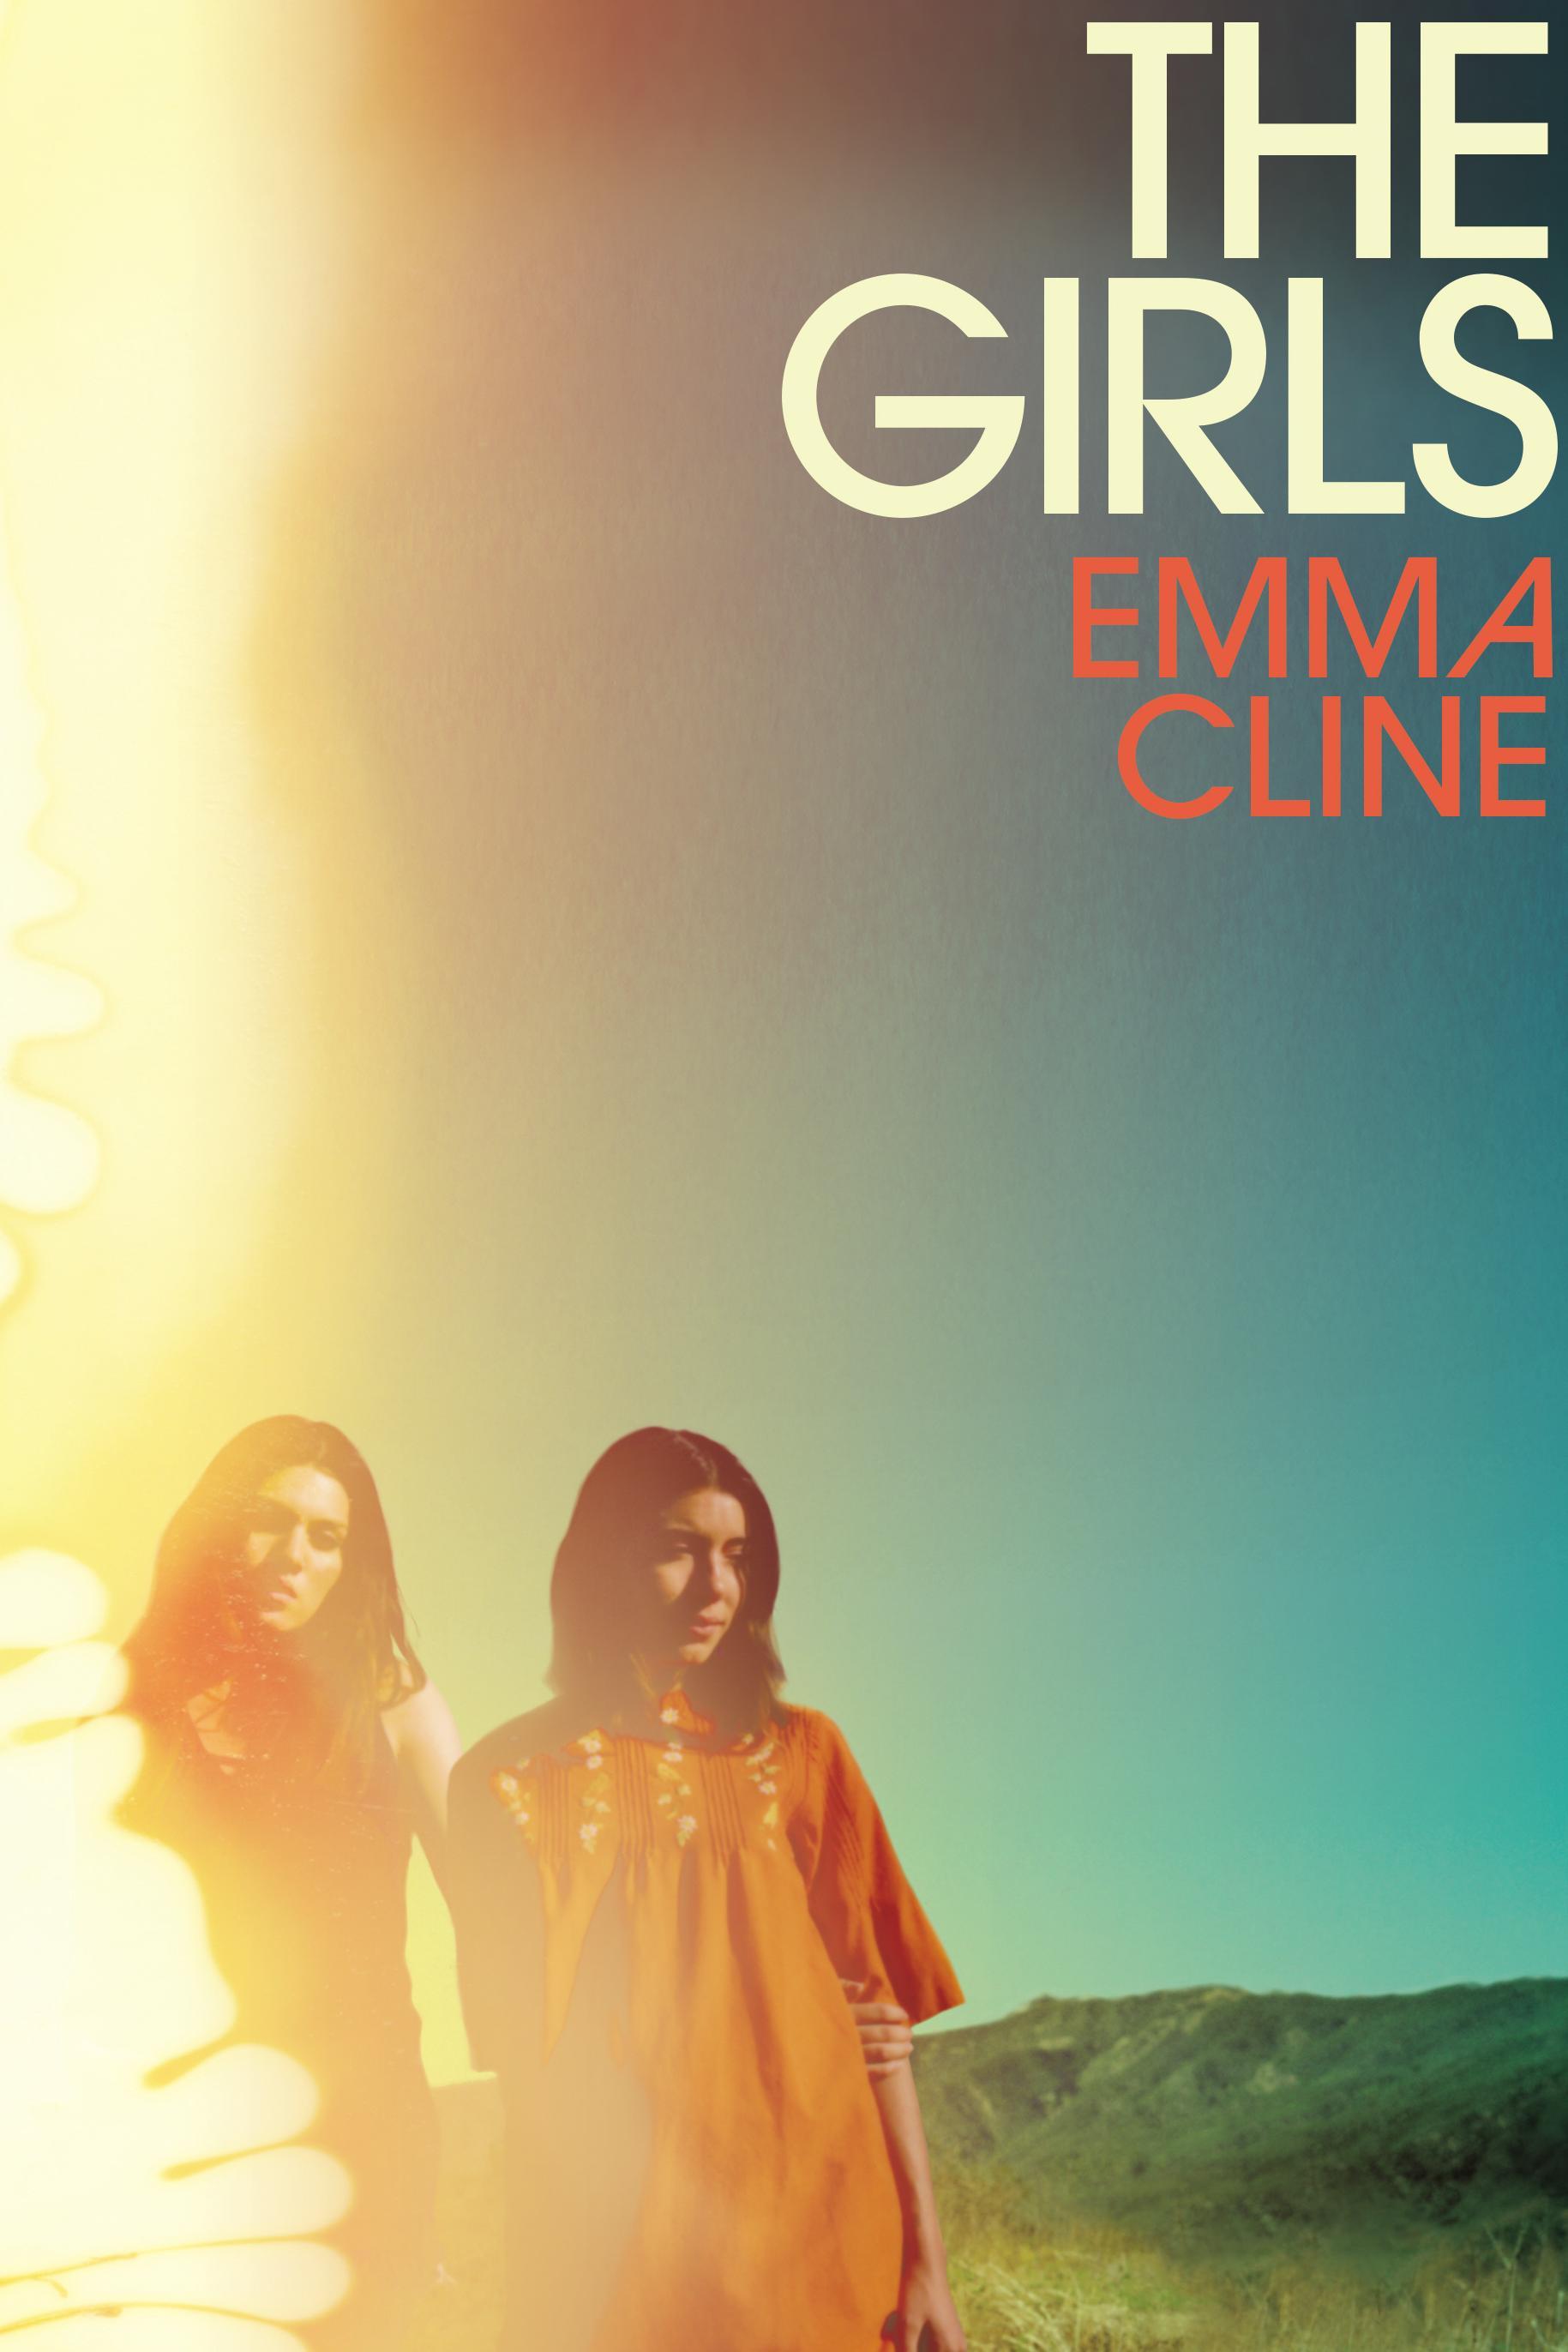 Image result for the girls emma cline